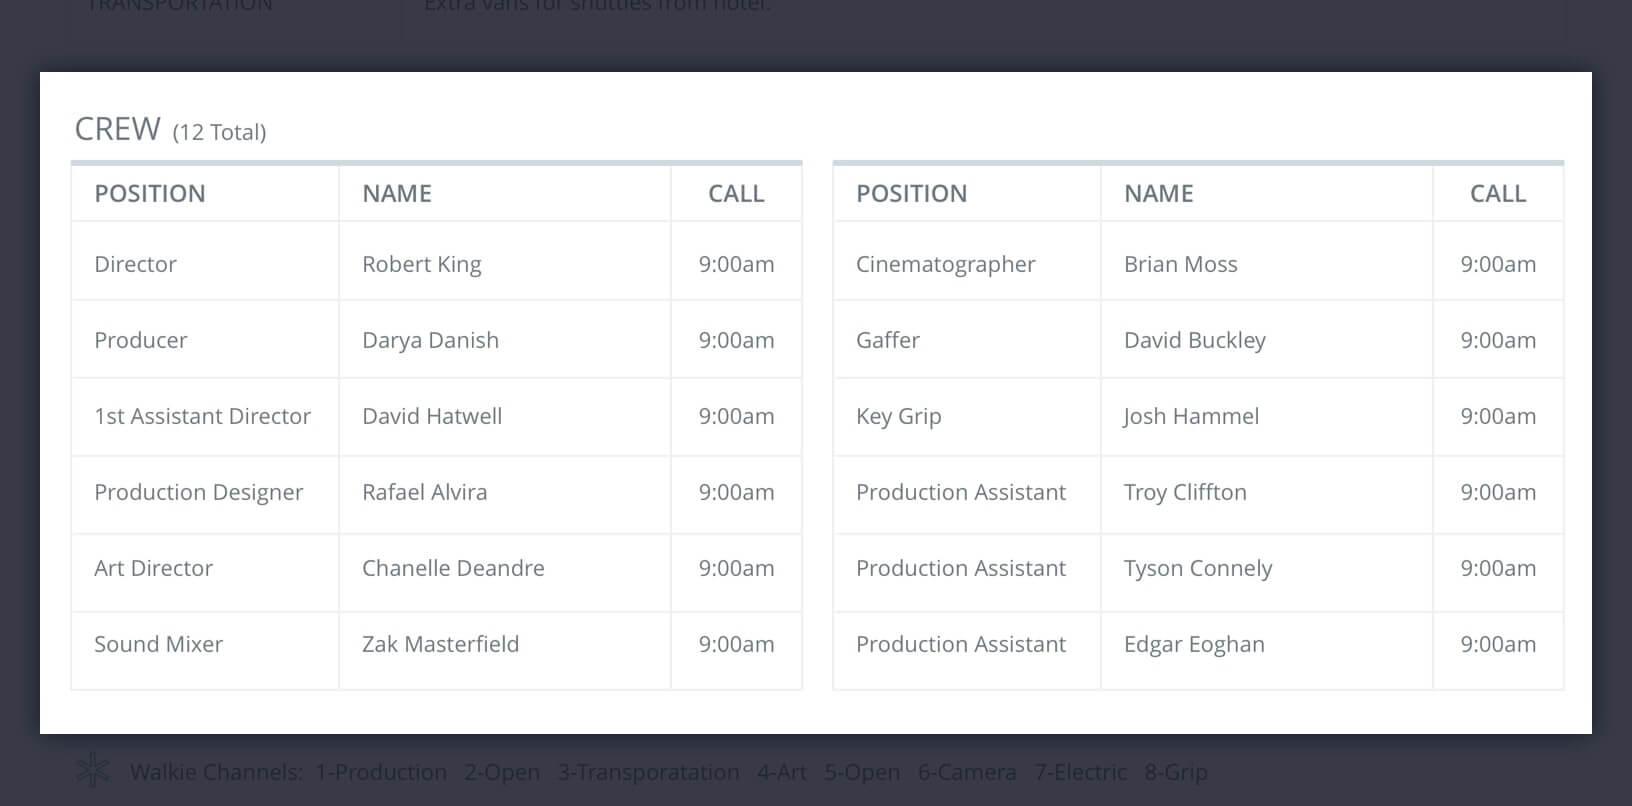 Callsheet Template Anatomy - Crew List - StudioBinder